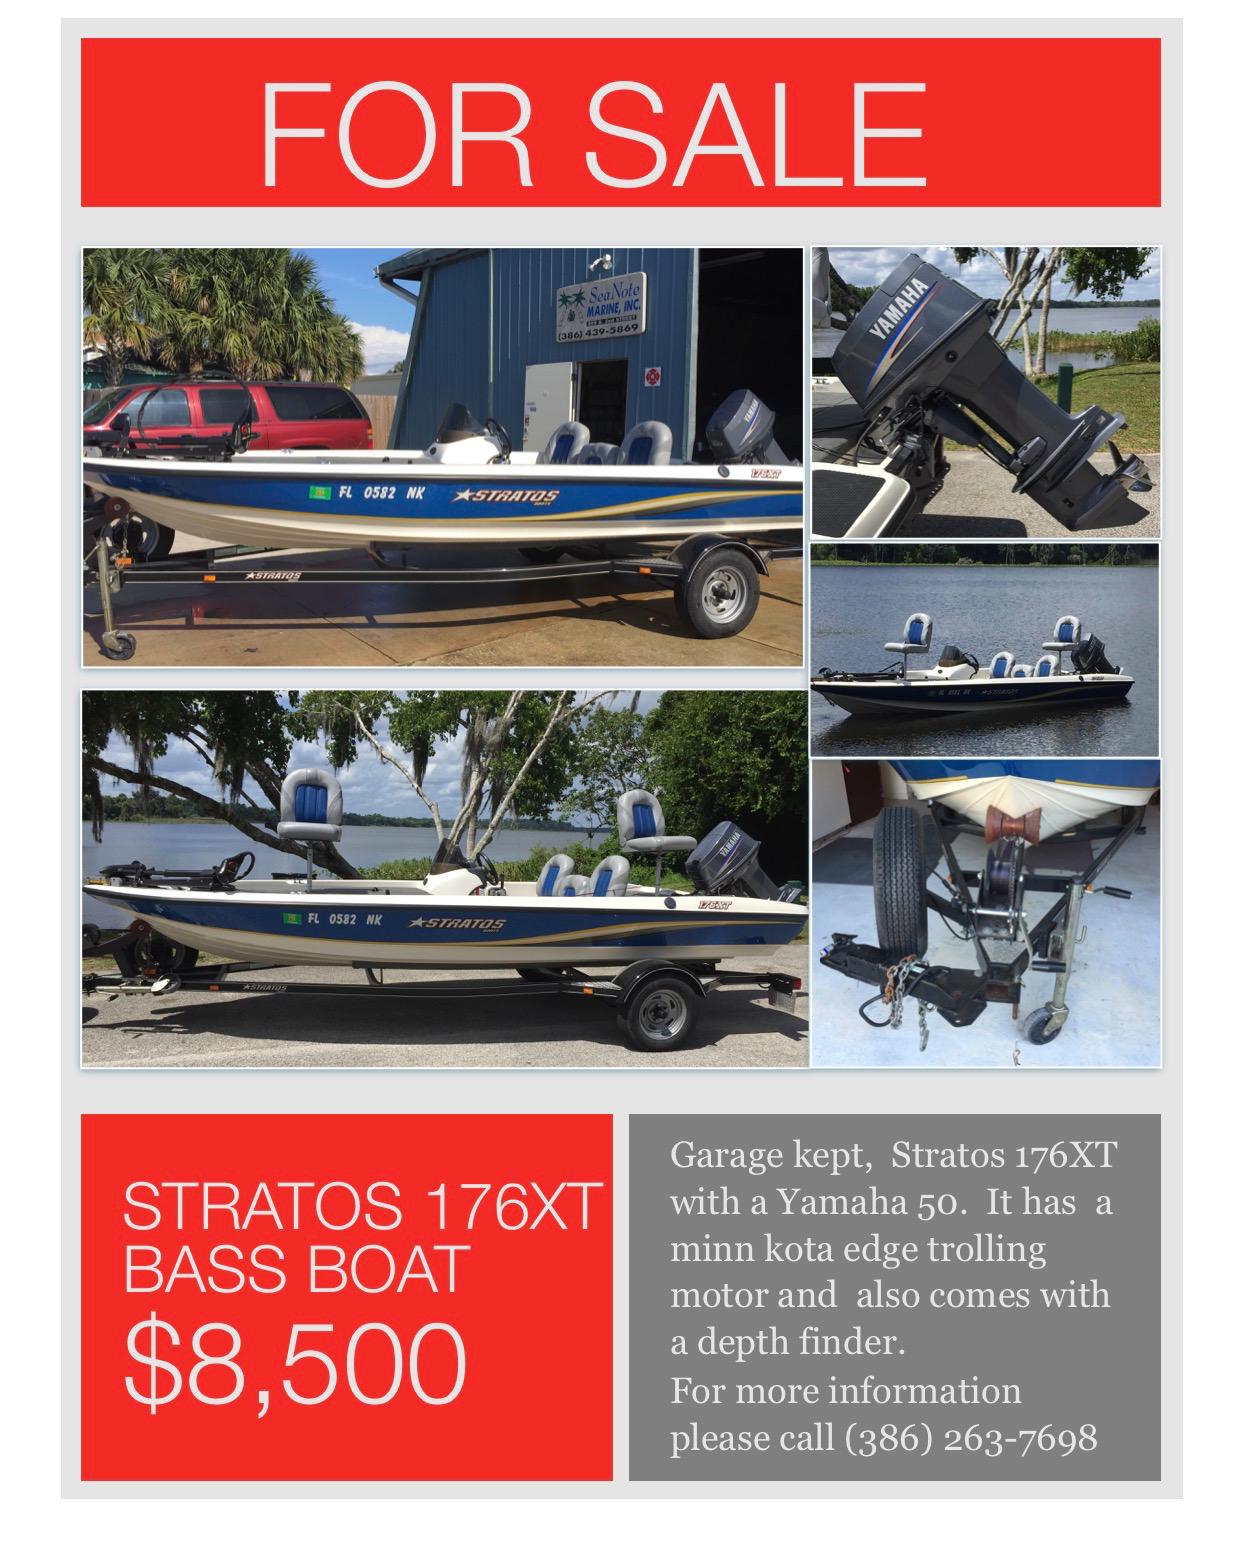 Stratos 176 XT